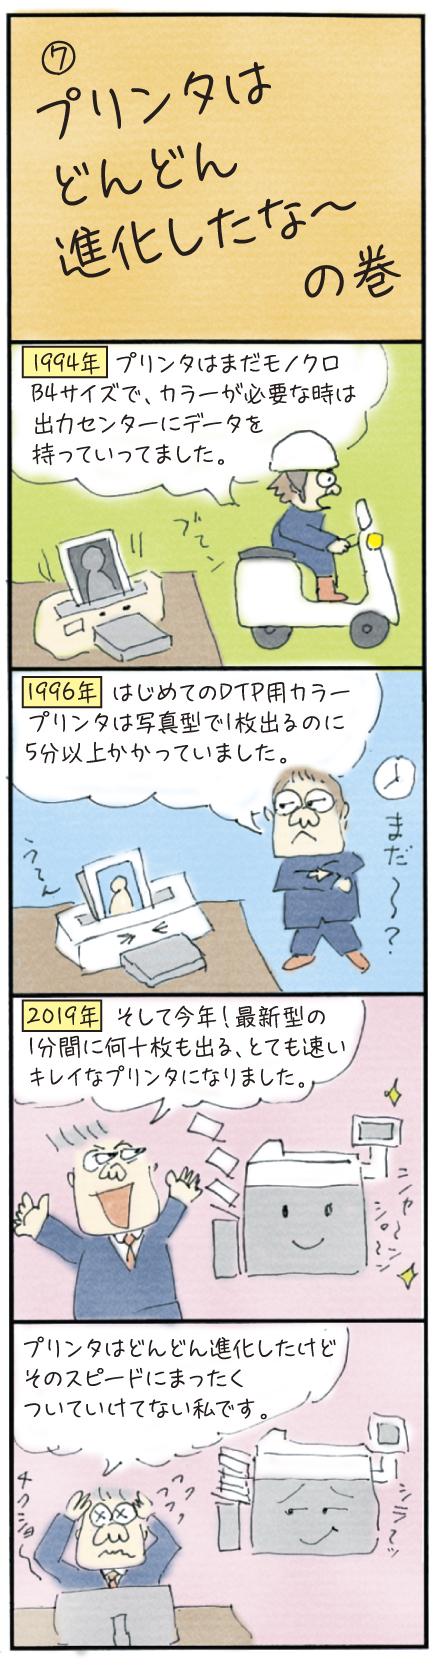 printer191125.jpg